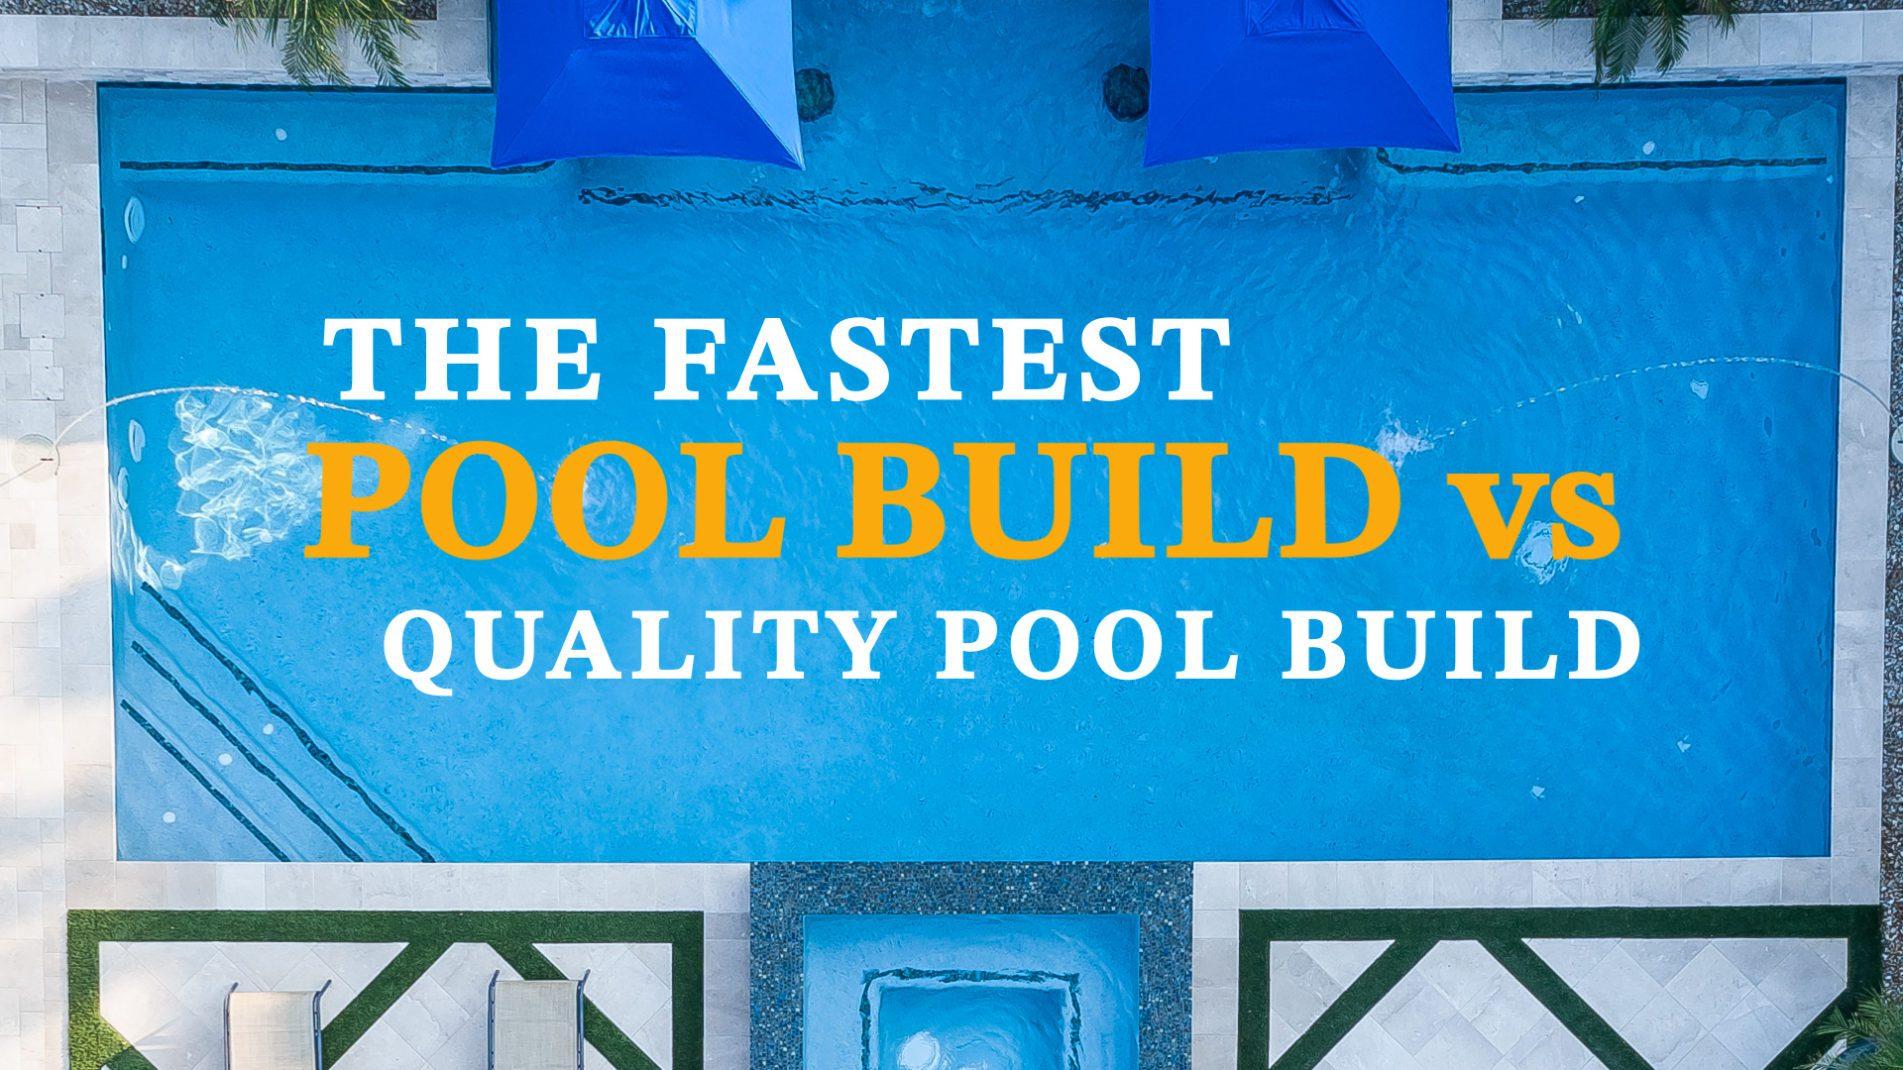 The Fastest Pool Build vs Quality Pool Build